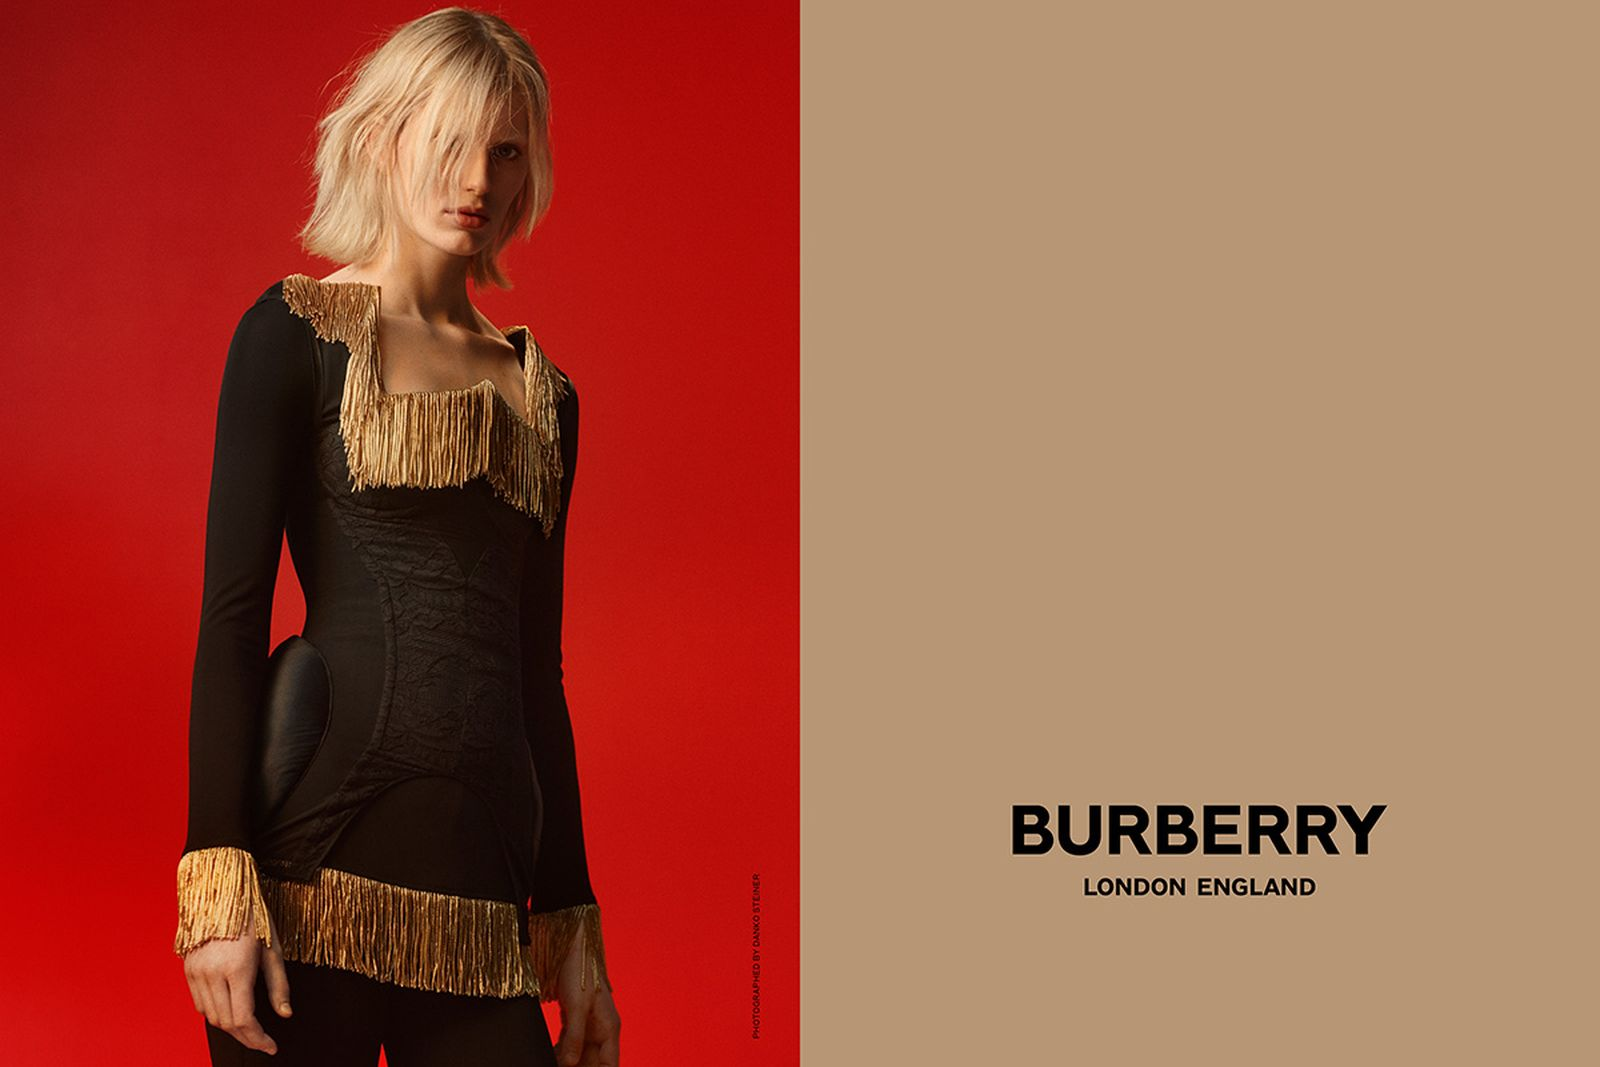 burberry ricardo tisci first campaign riccardo tisci